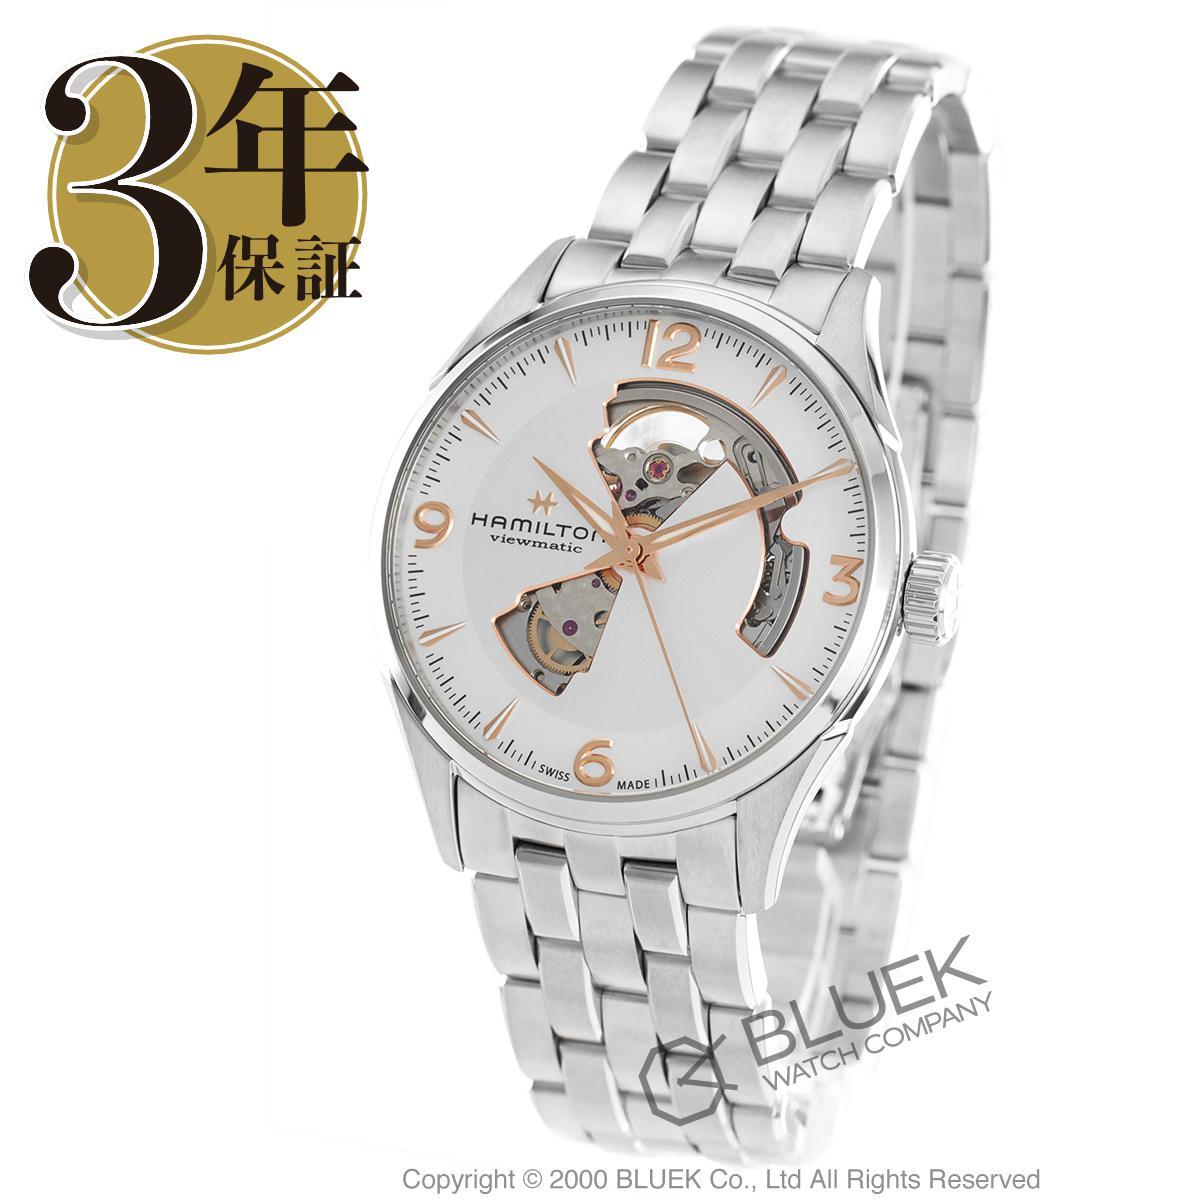 878ff9f83d ハミルトン ジャズマスター ビューマチック オープンハート 腕時計 メンズ HAMILTON H32705151_8 。